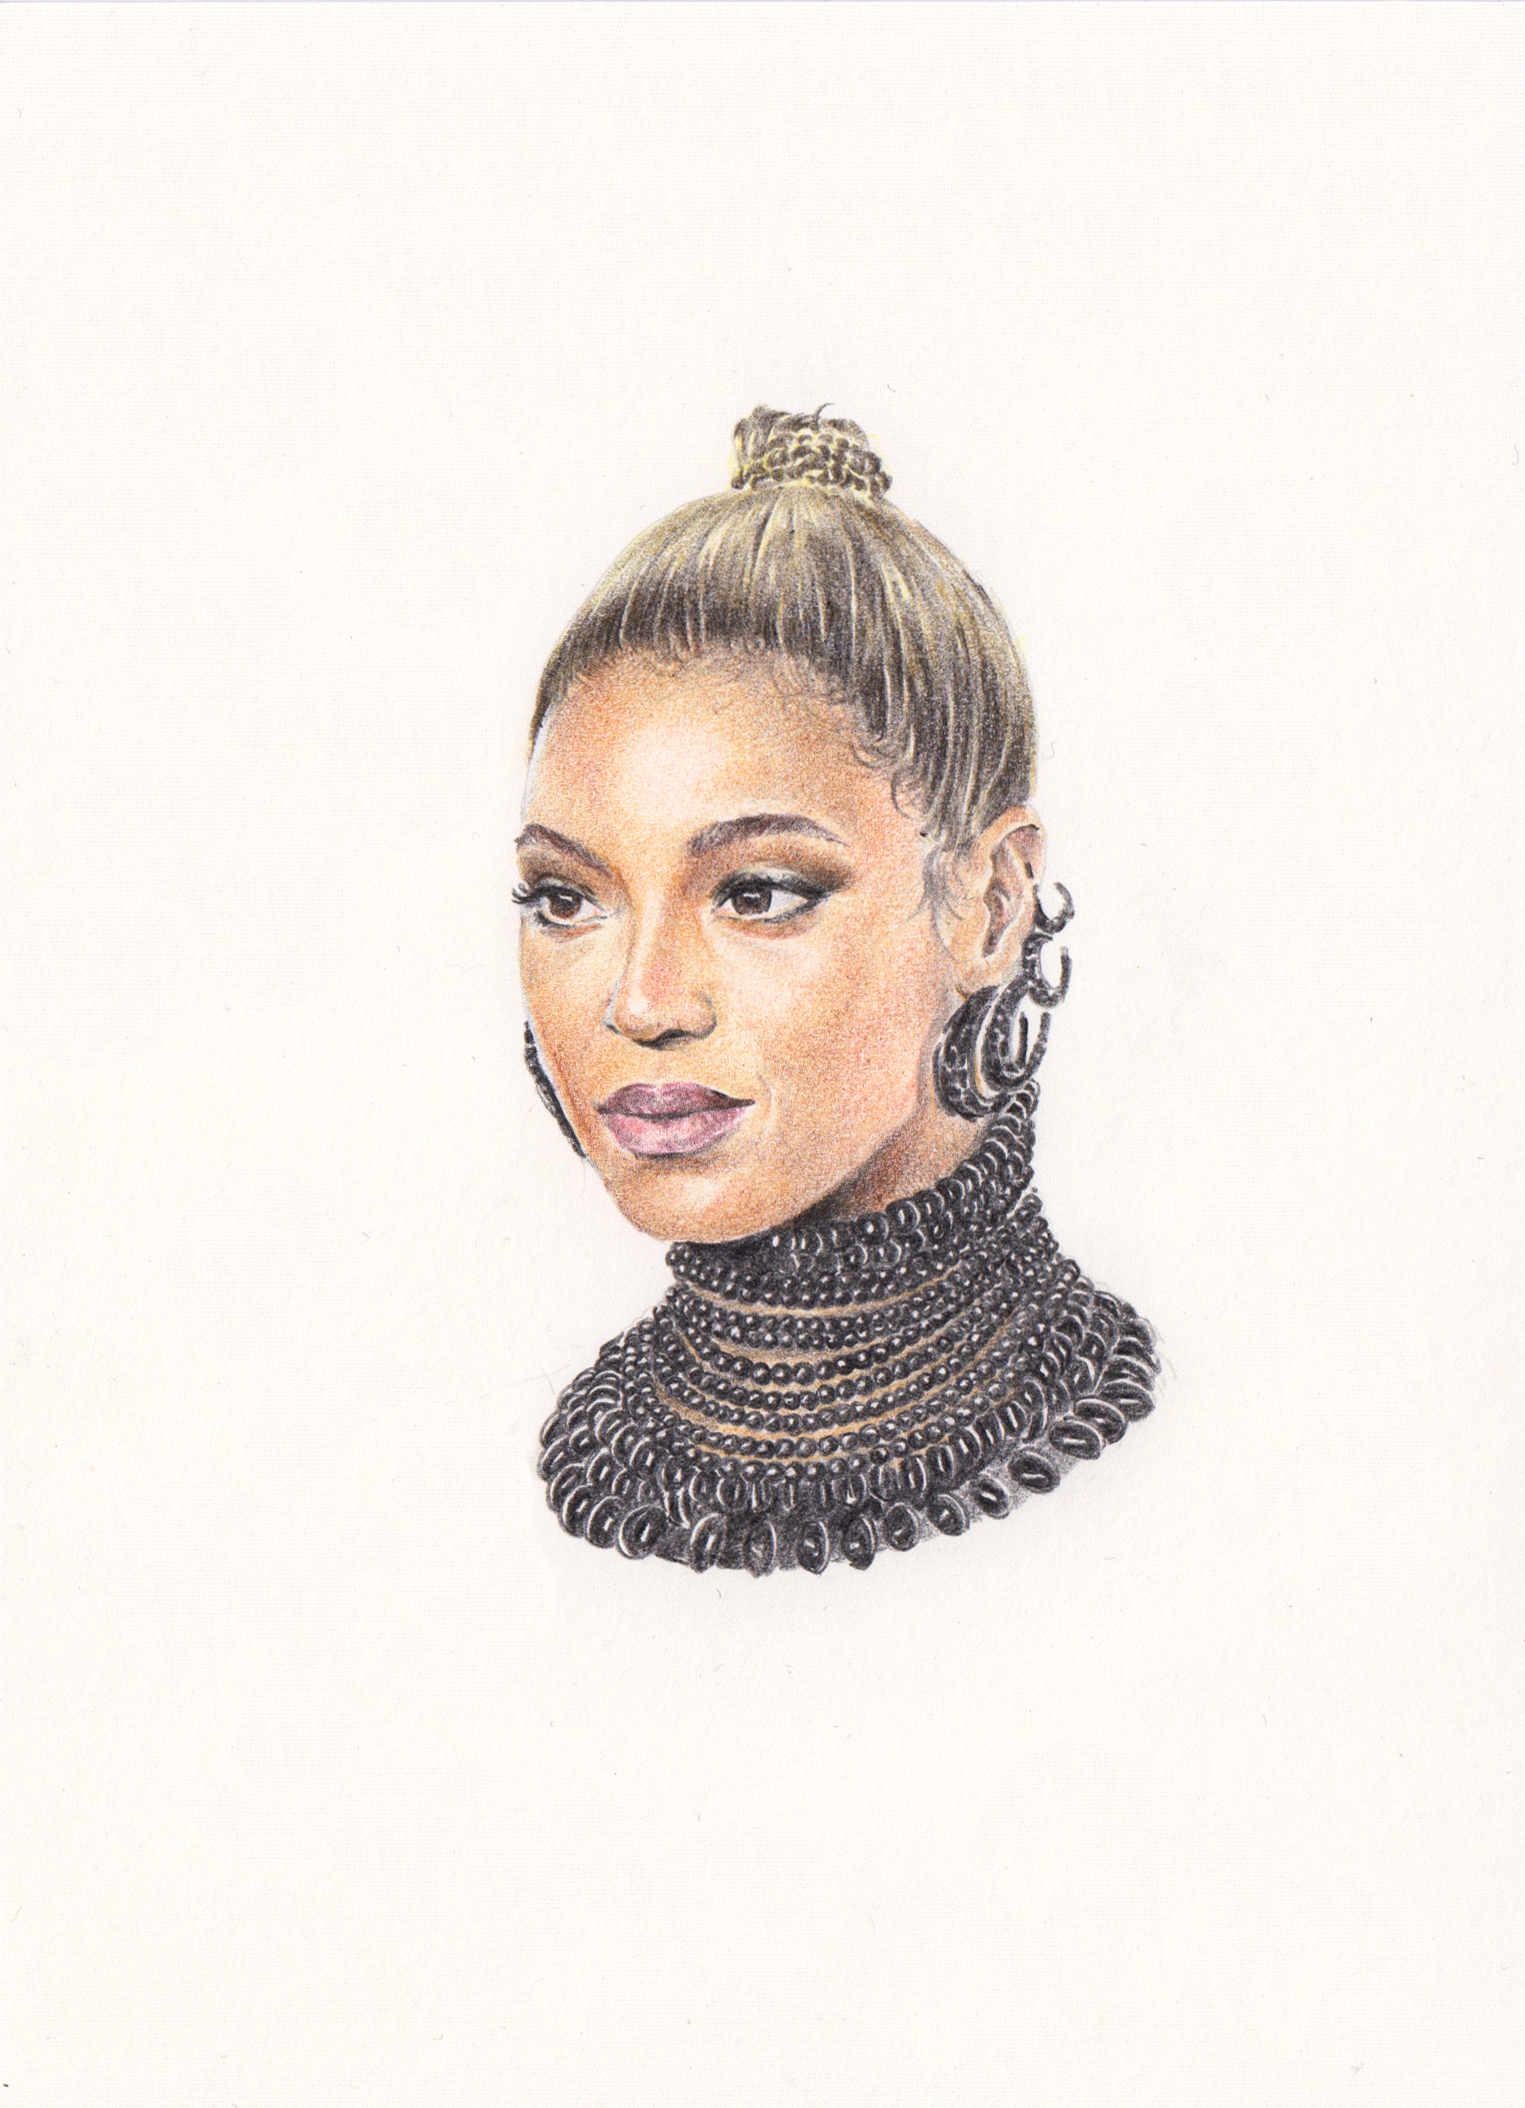 Loveblood Creative- Alexandre Luu - Beyonce.jpg